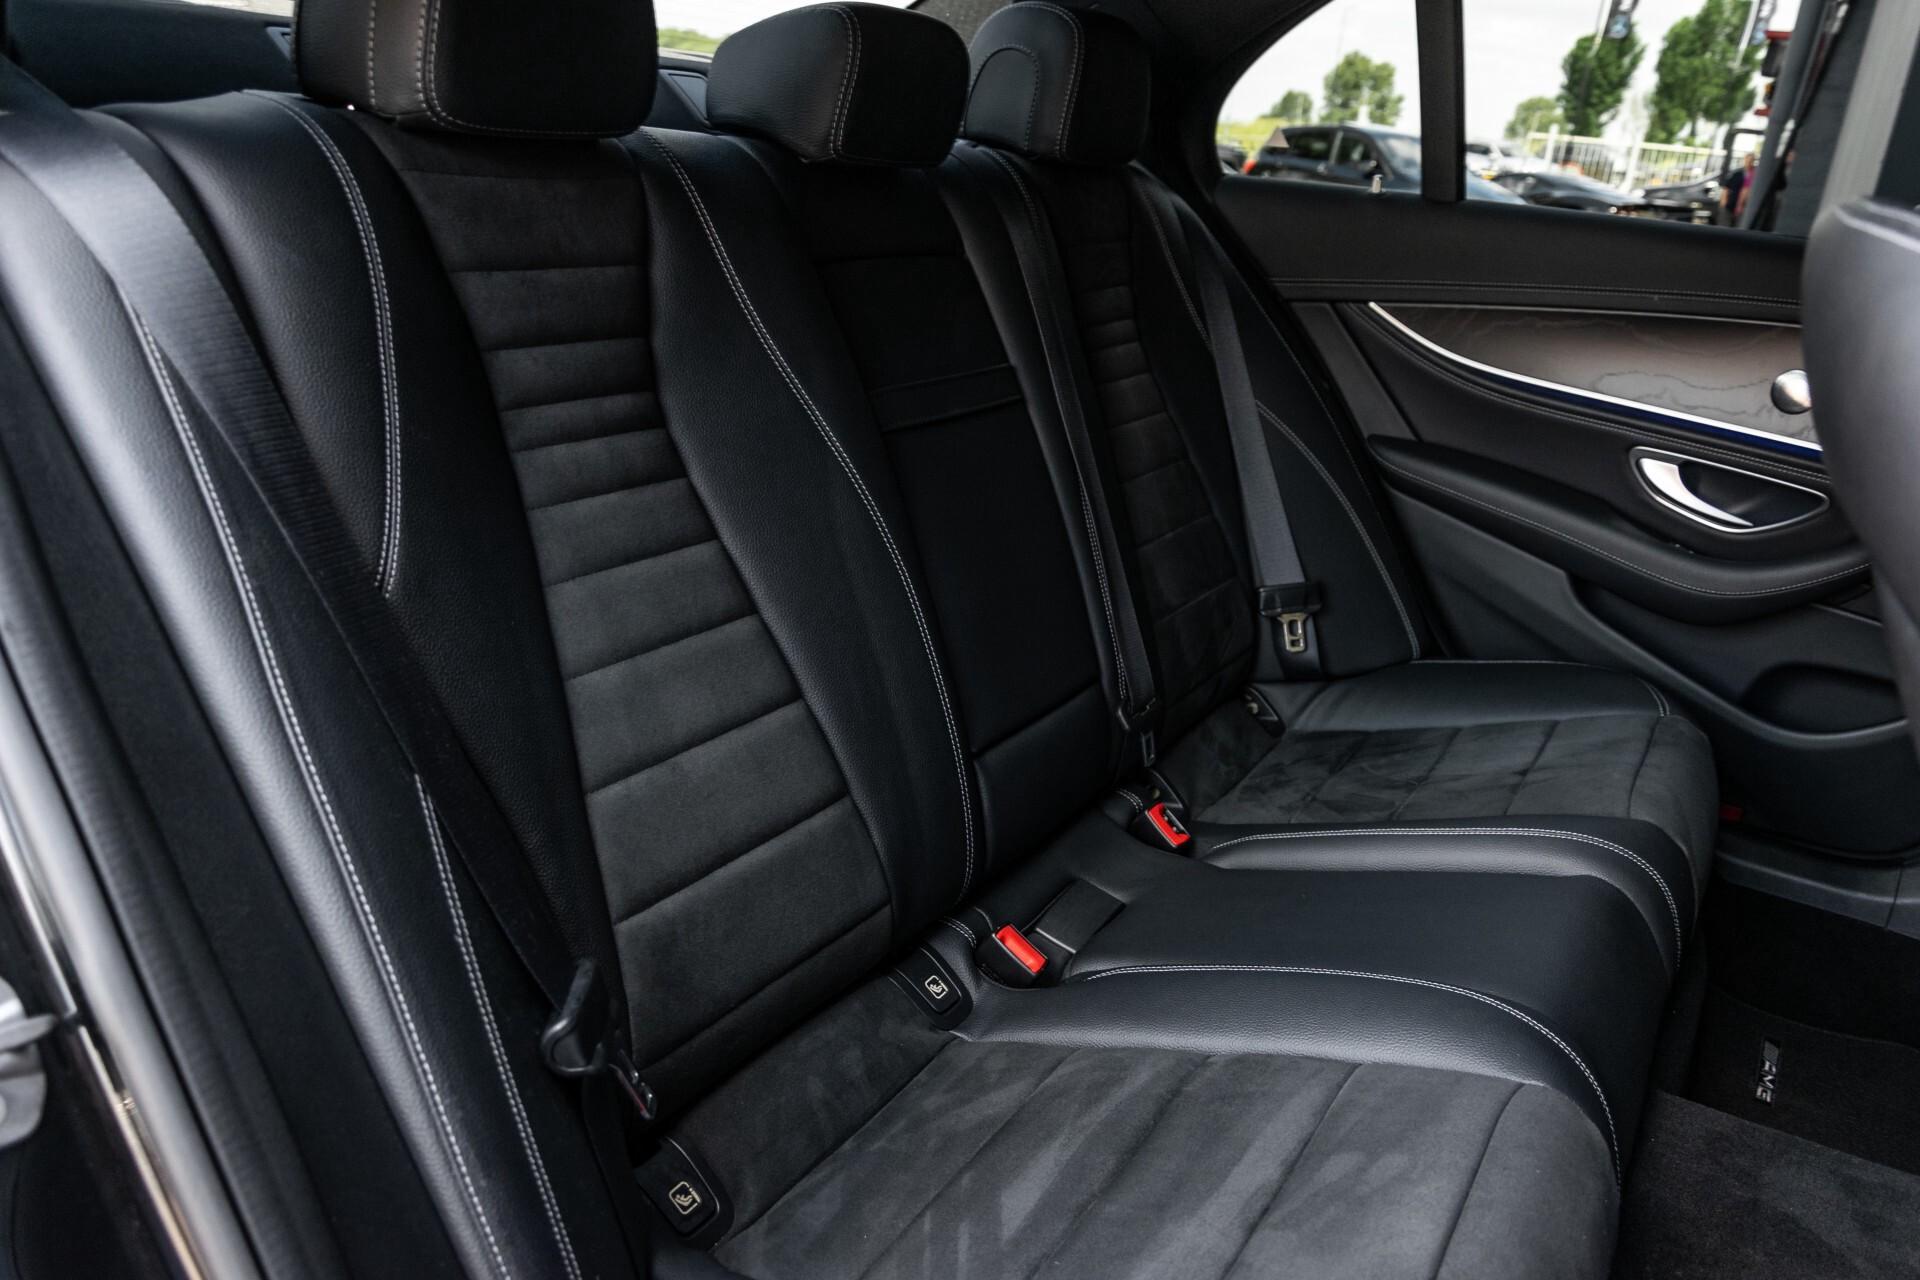 "Mercedes-Benz E-Klasse 220 d AMG Night Panorama/Widescreen/Burmester/20""/Wegklapbare trekhaak Aut9 Foto 5"